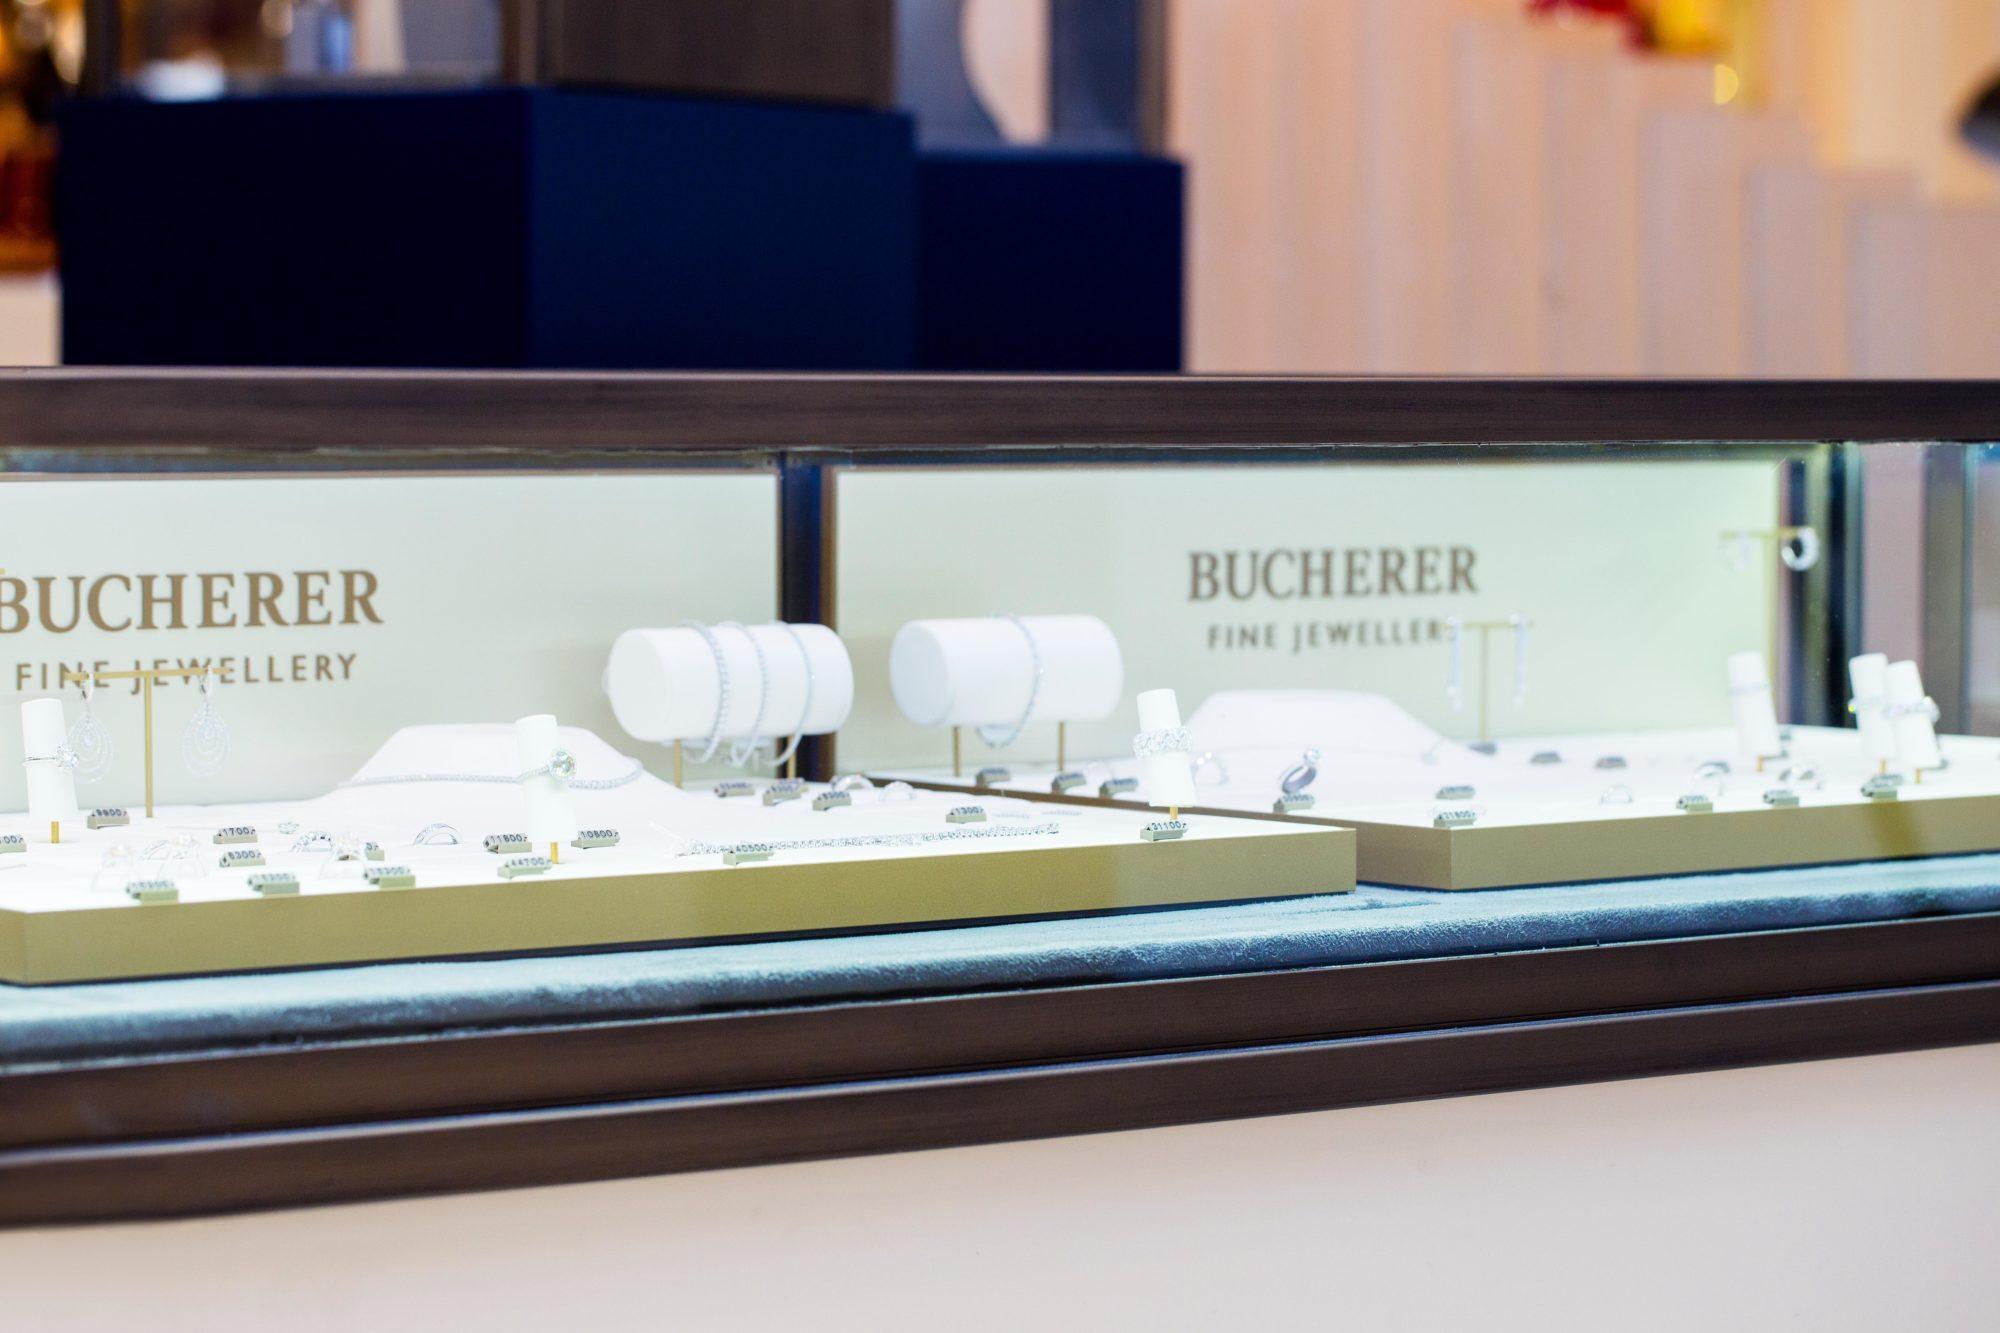 Bucherer Jewellery Retail Design